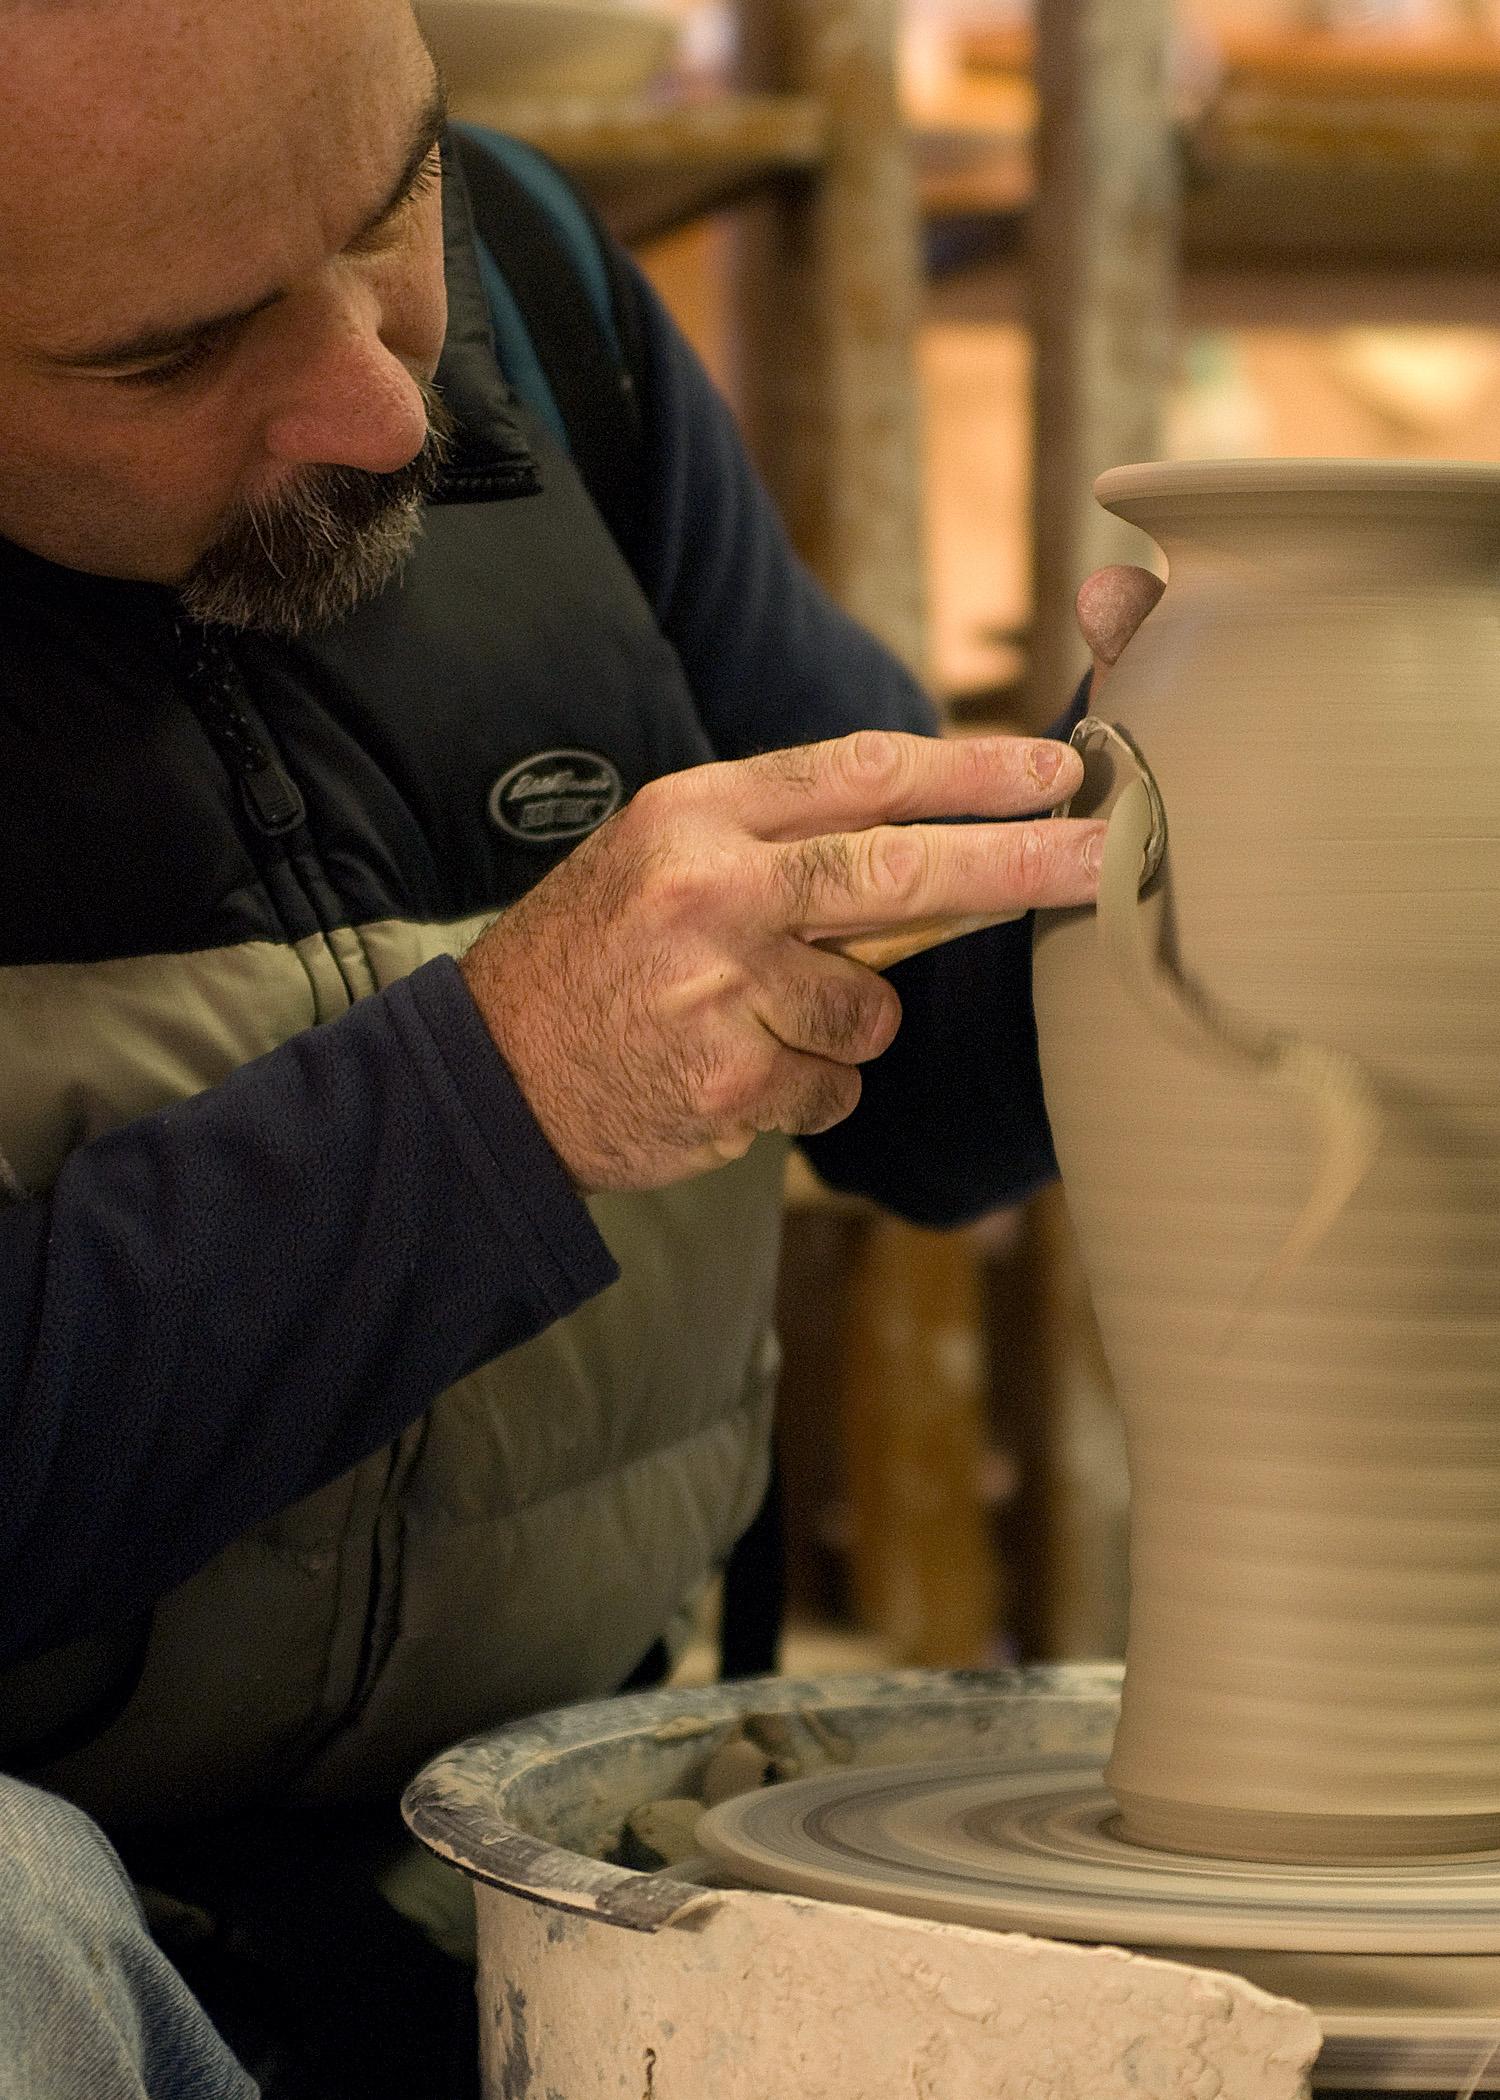 Putting finishing touches on a vase.